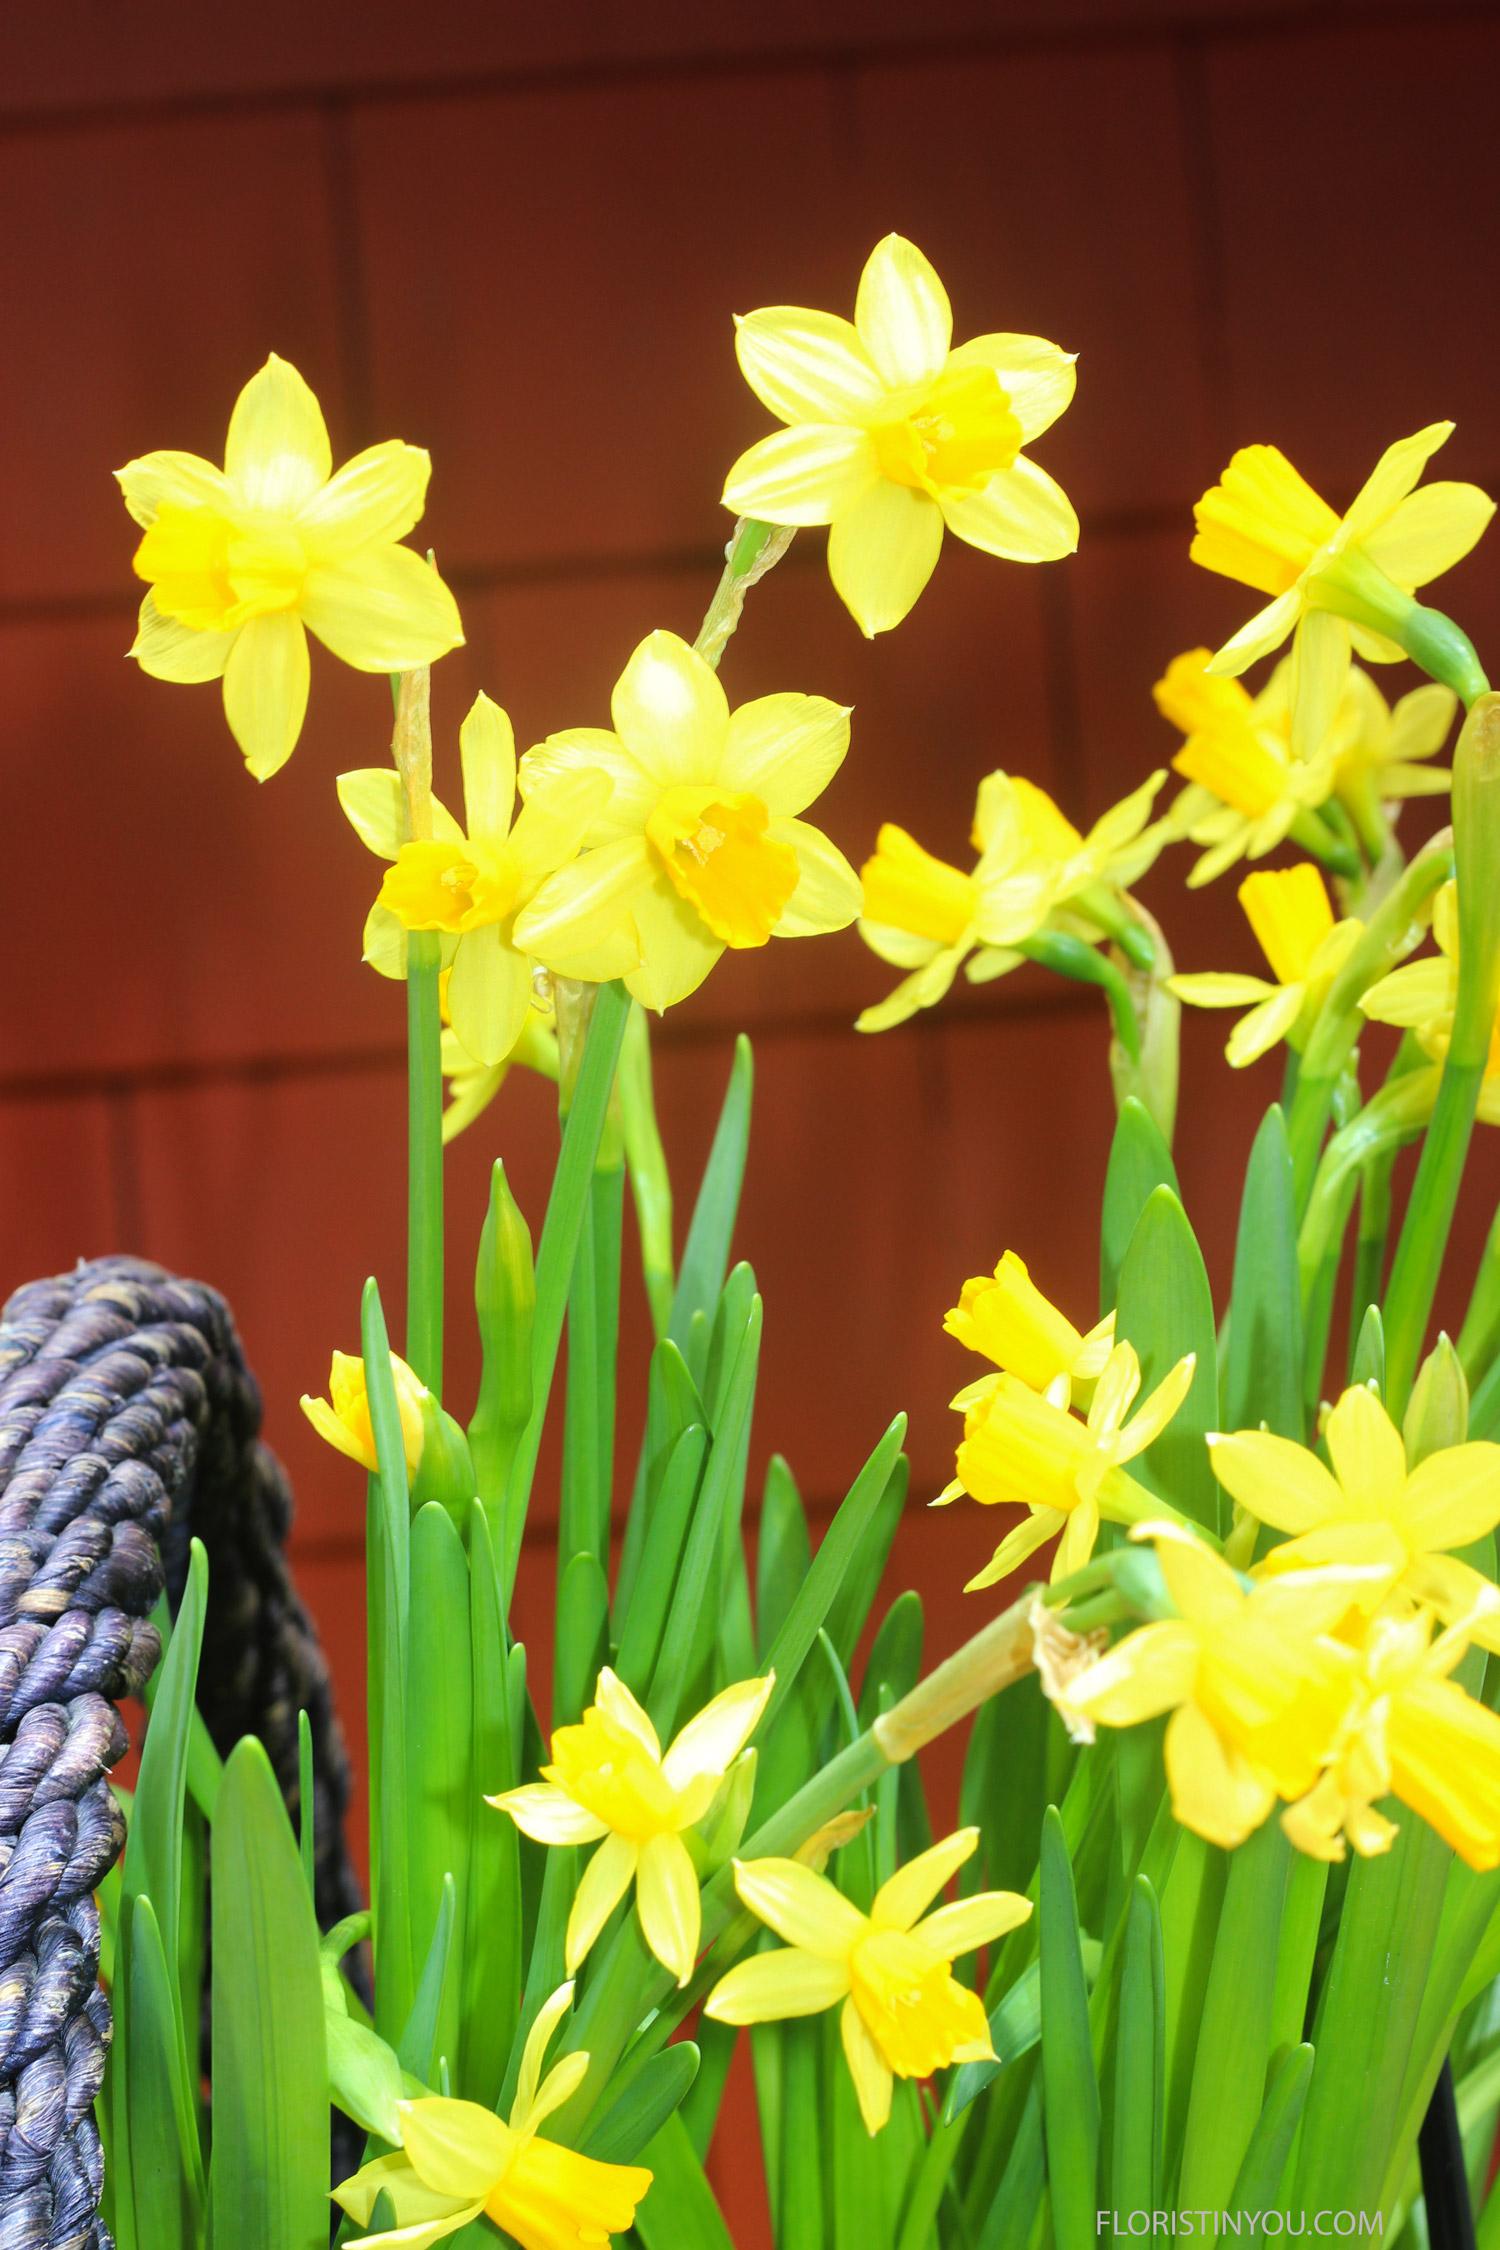 And Mini Daffodils.